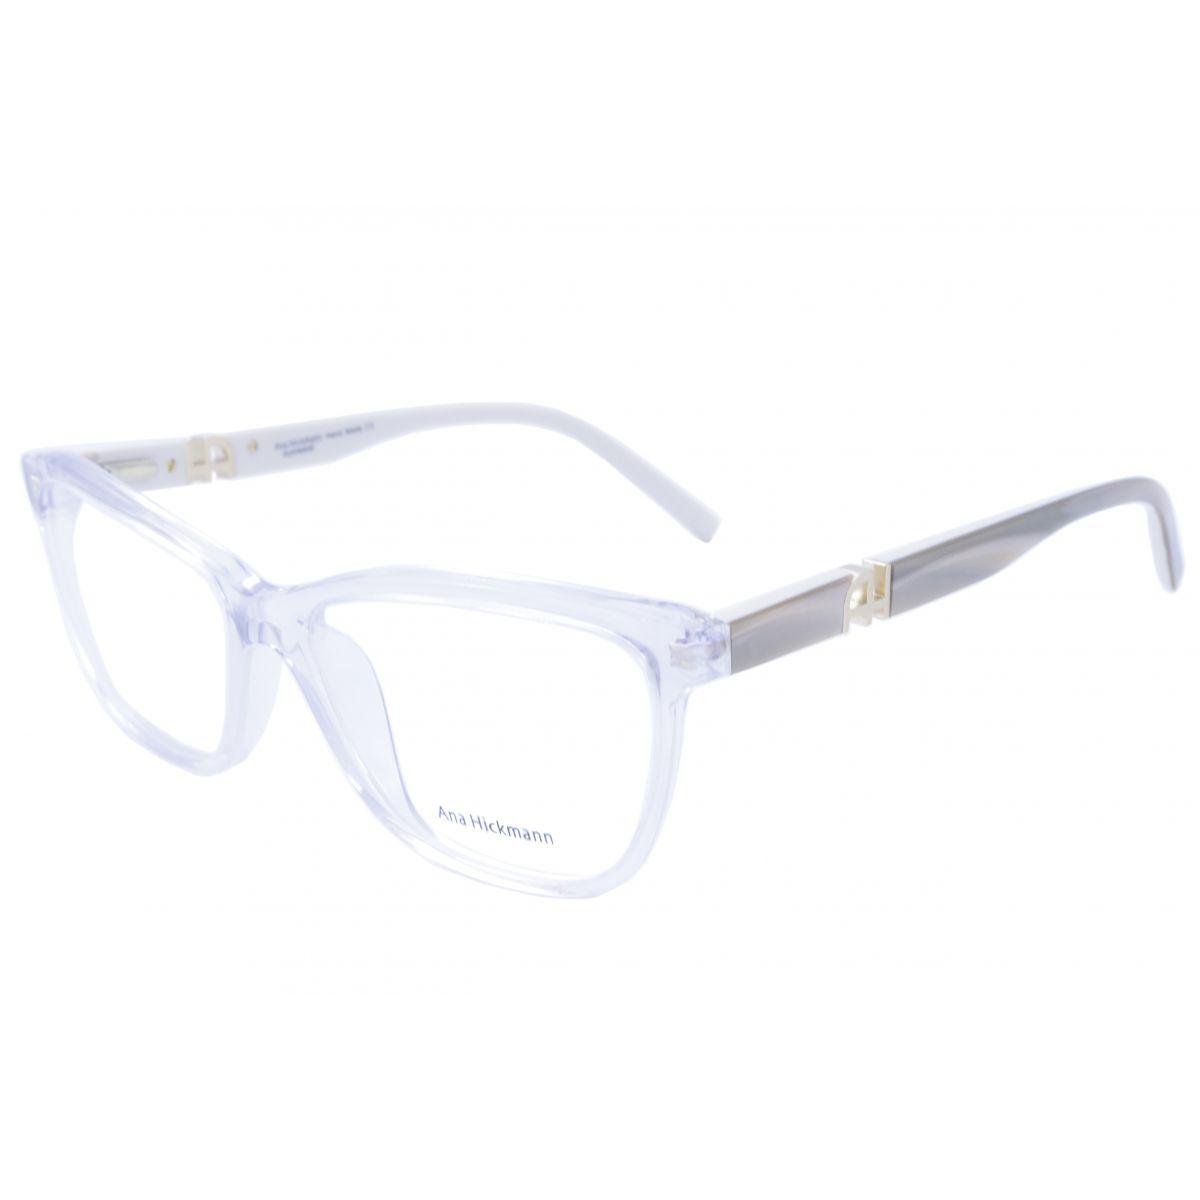 a37a14f2f2b44 Óculos De Grau Feminino Ana Hickmann AH6181 A04 Tam.54Ana Hickmann  OriginalAna Hickmann .. Óculos Ana Hickmann AH6127N branco haste giratória  onça tartaruga